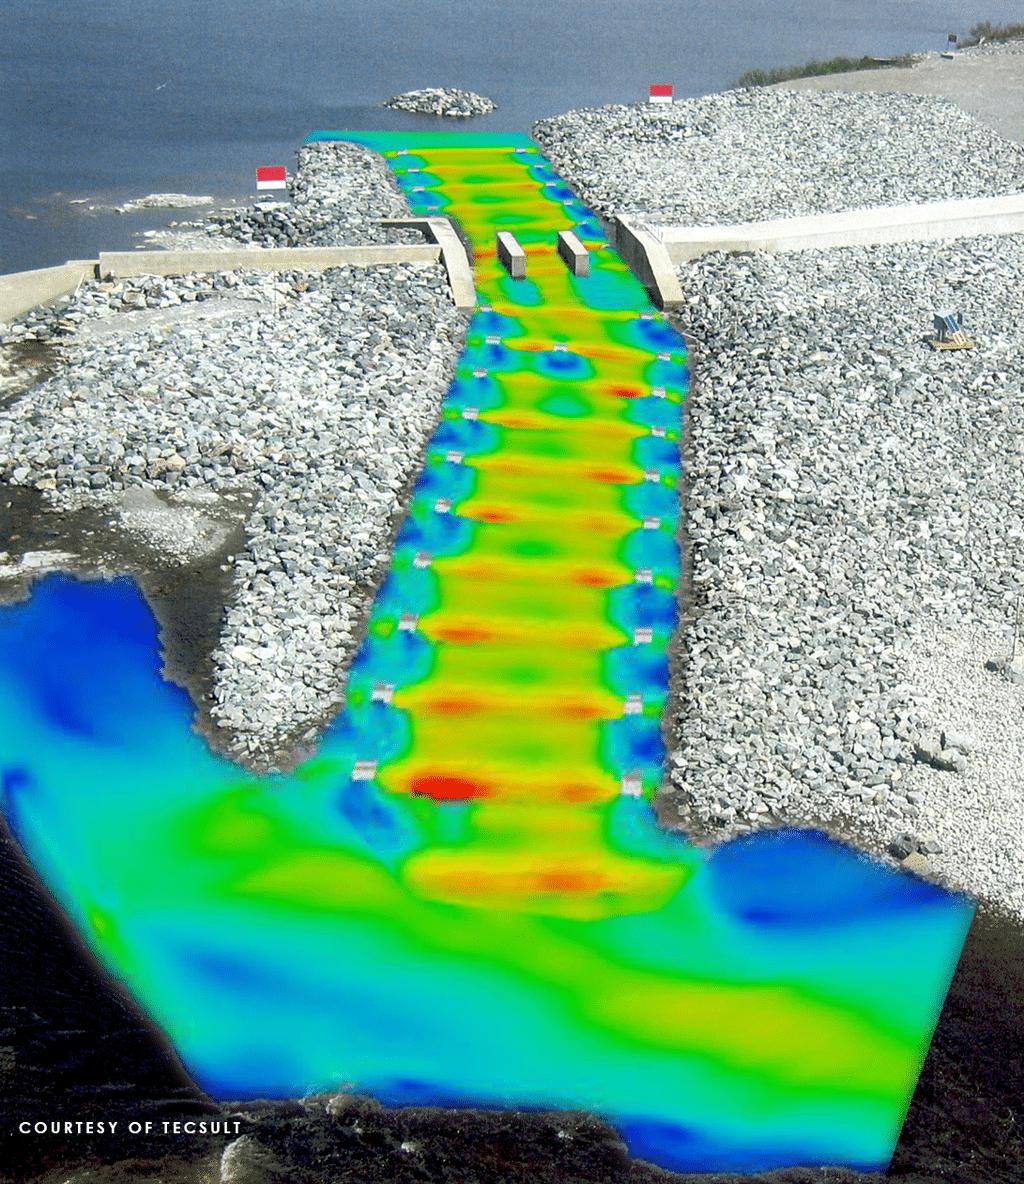 Fishway simulation